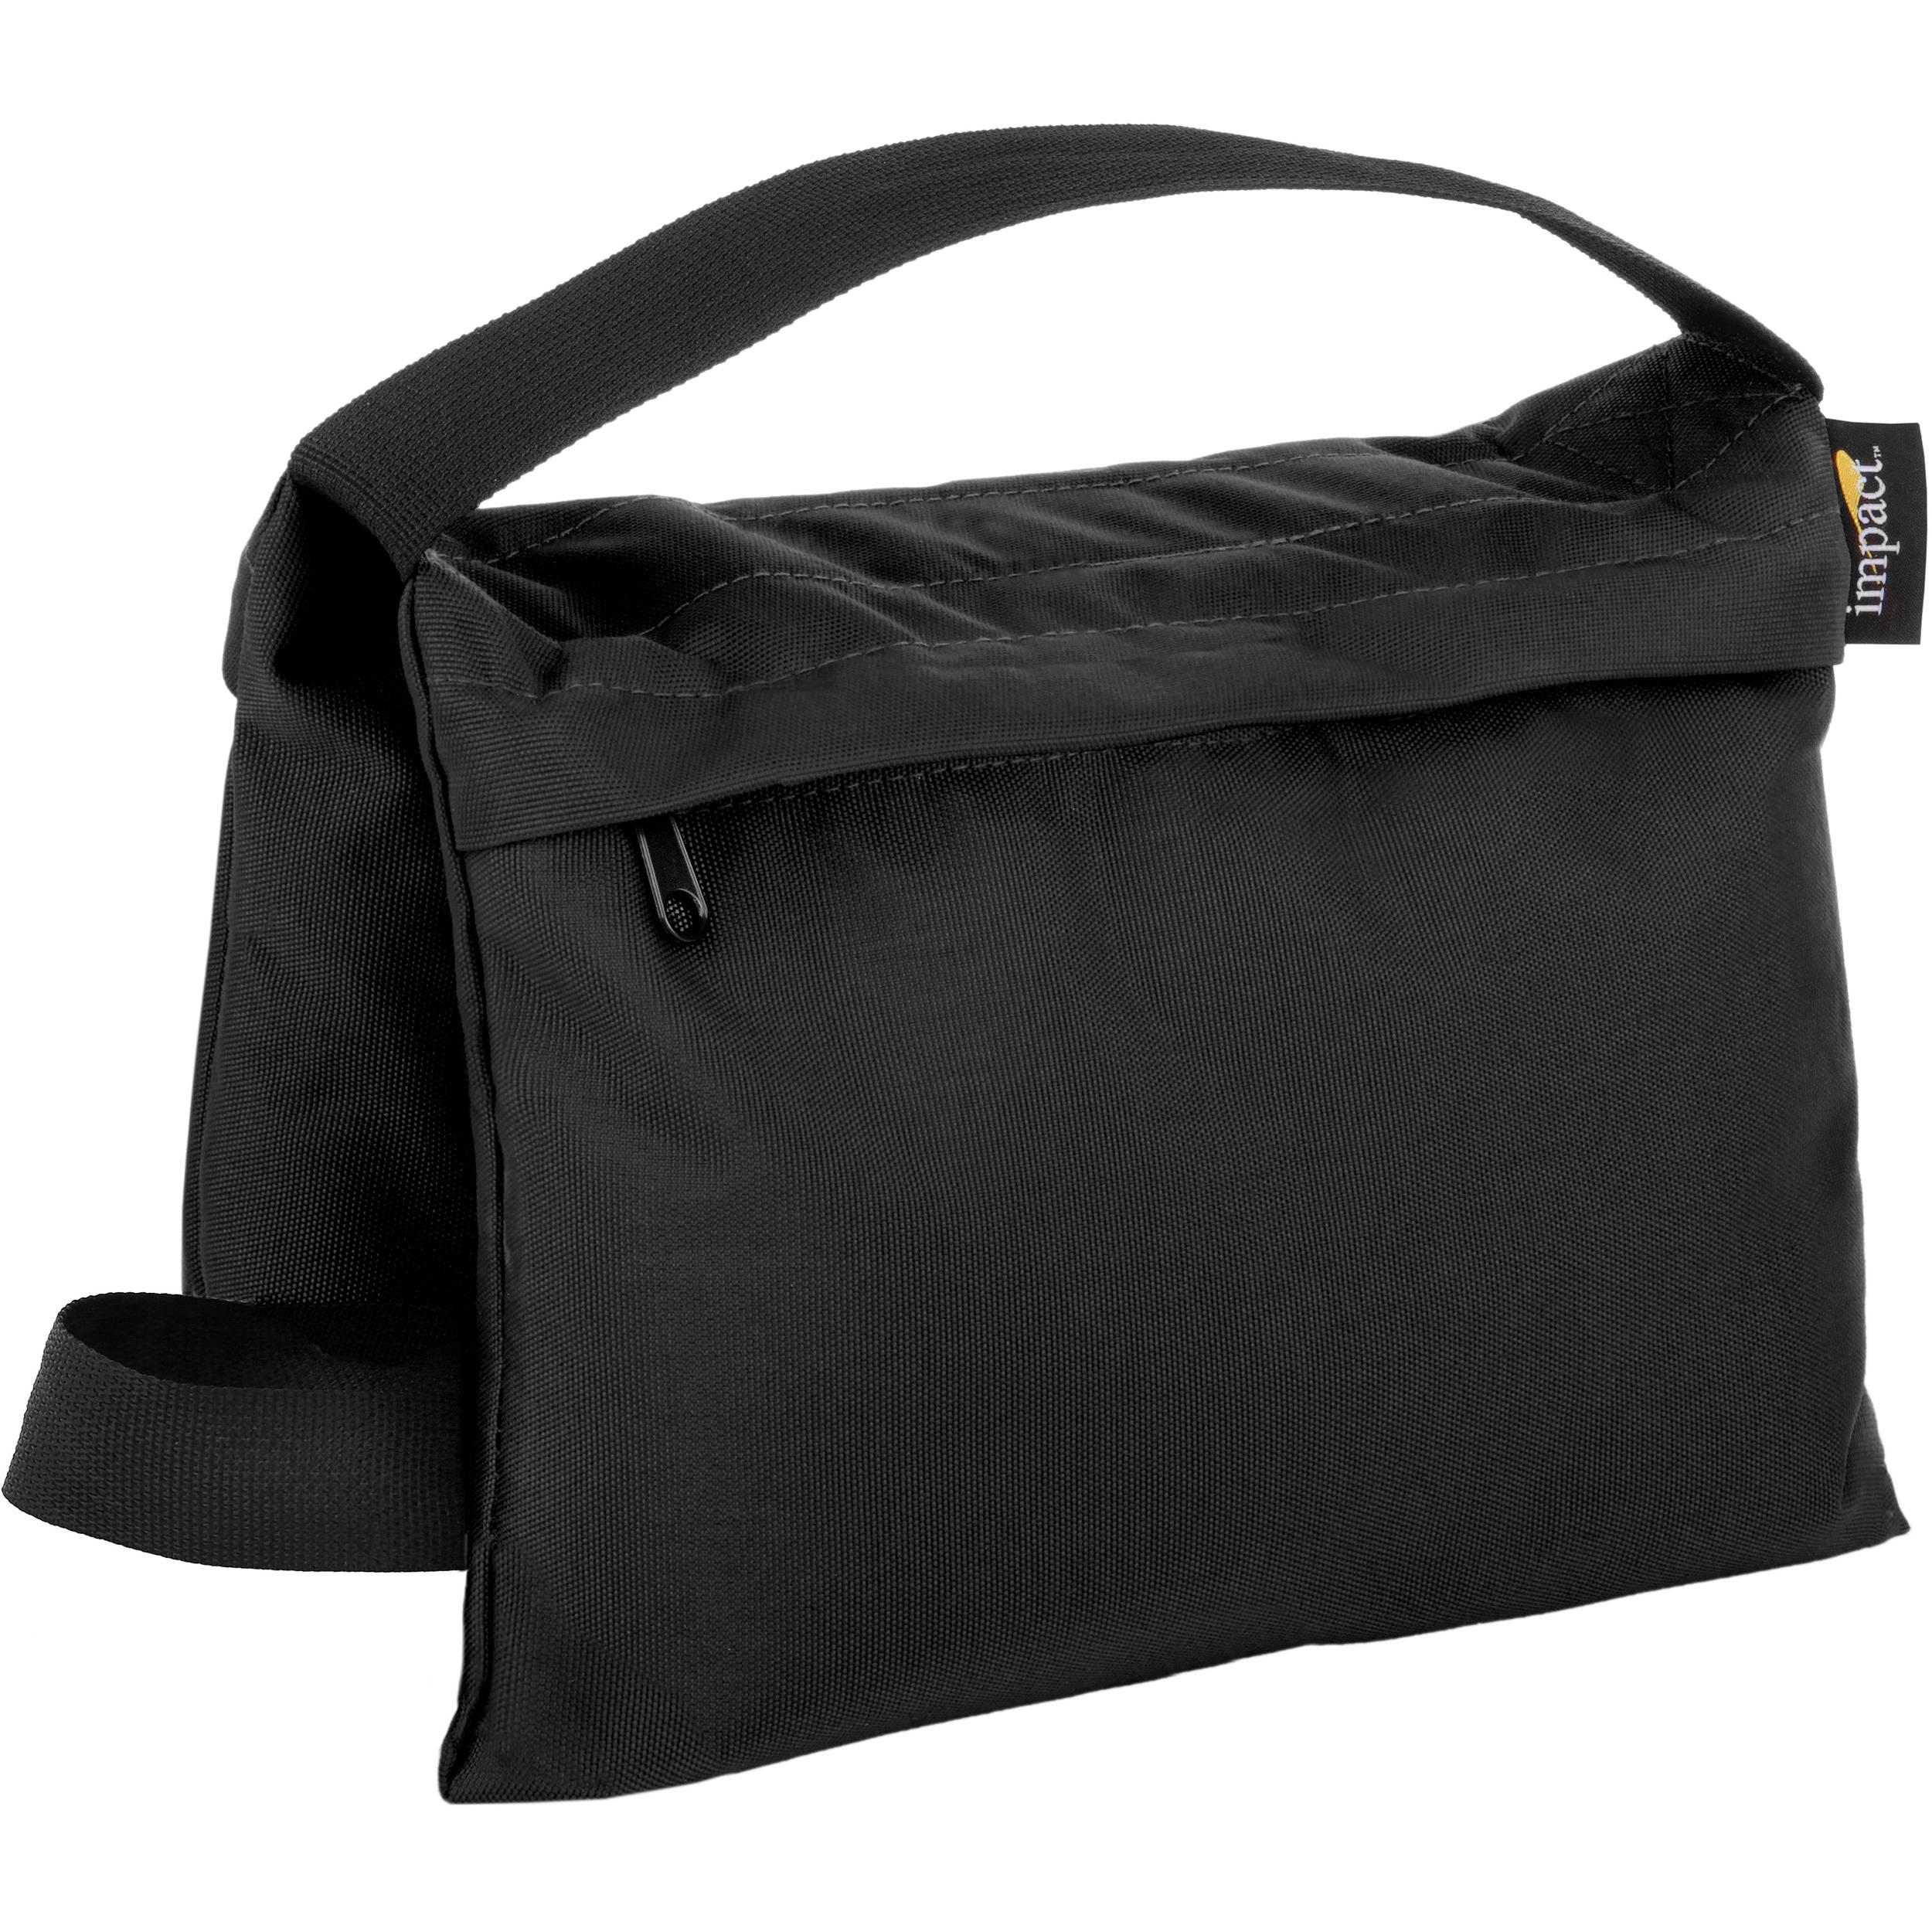 BLACK WITH BLUE HANDLE SAND BAG 20LB